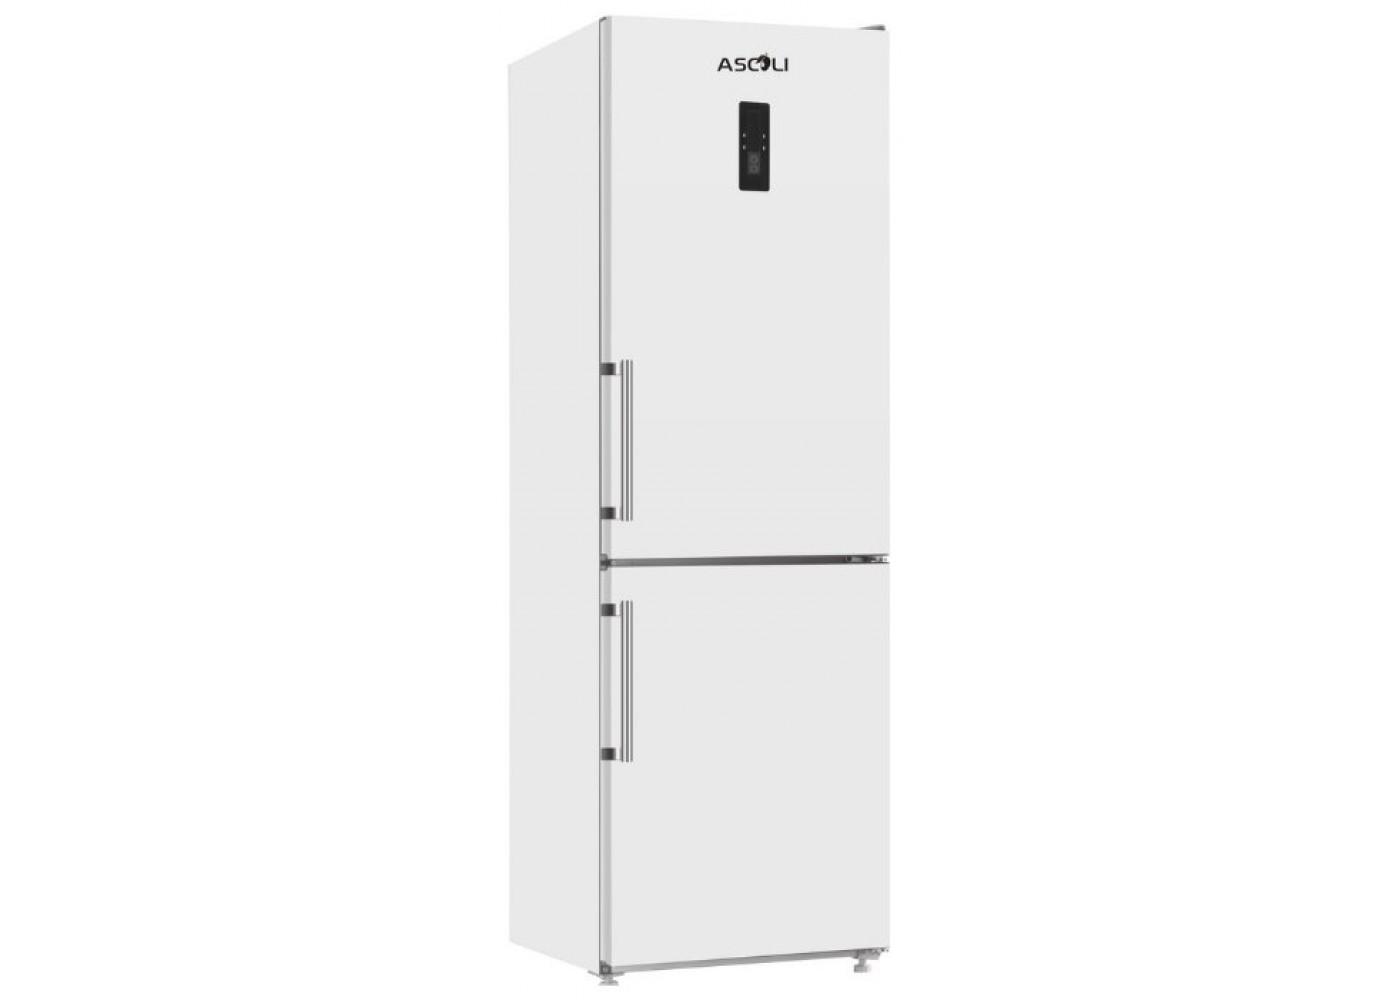 Холодильник ASCOLI ADRFW375WG белый (стекло, FNF)